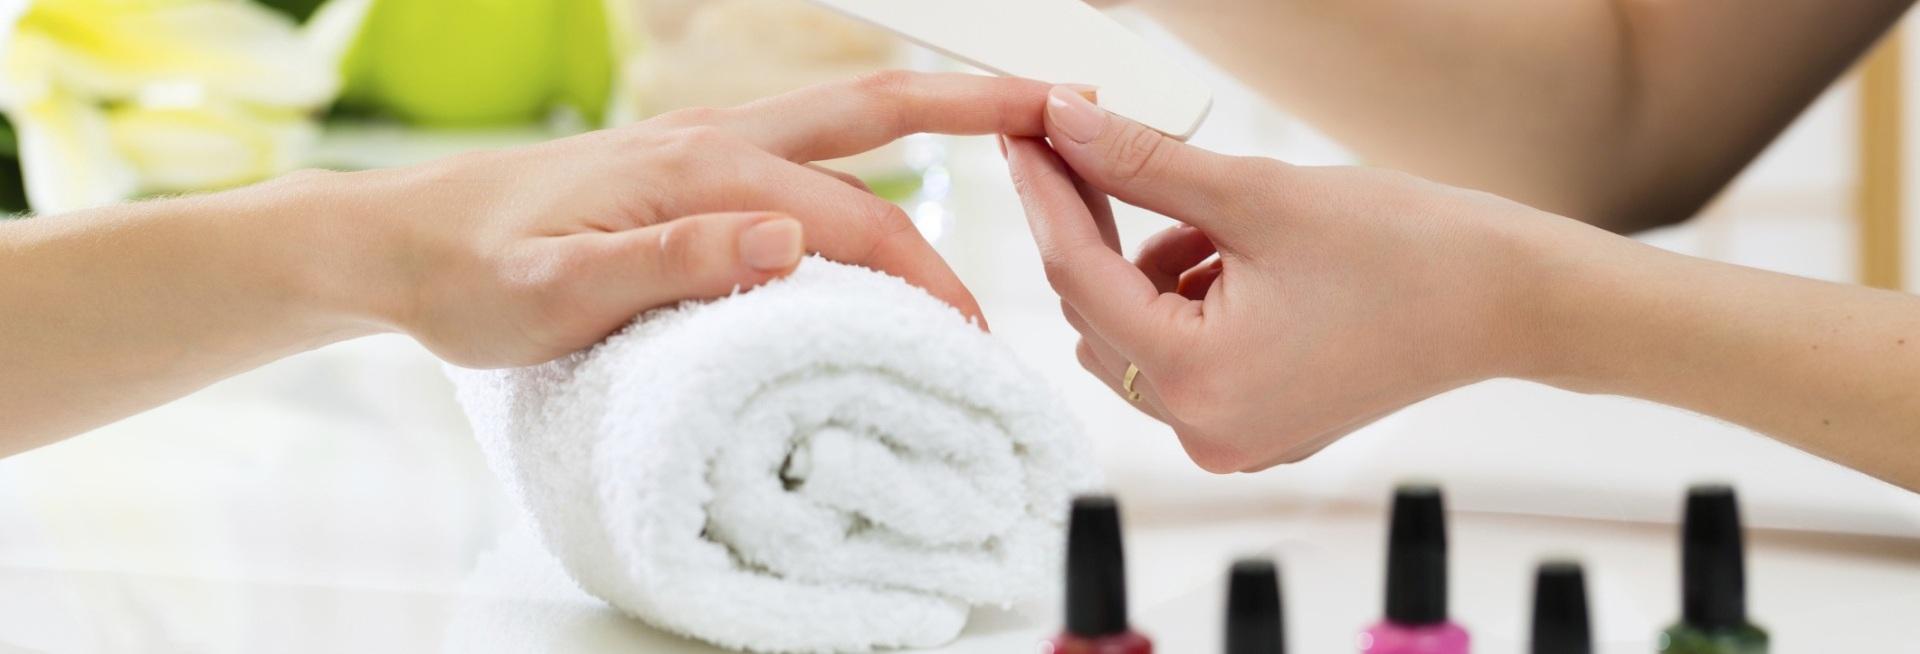 Business Plan For Nail Salon